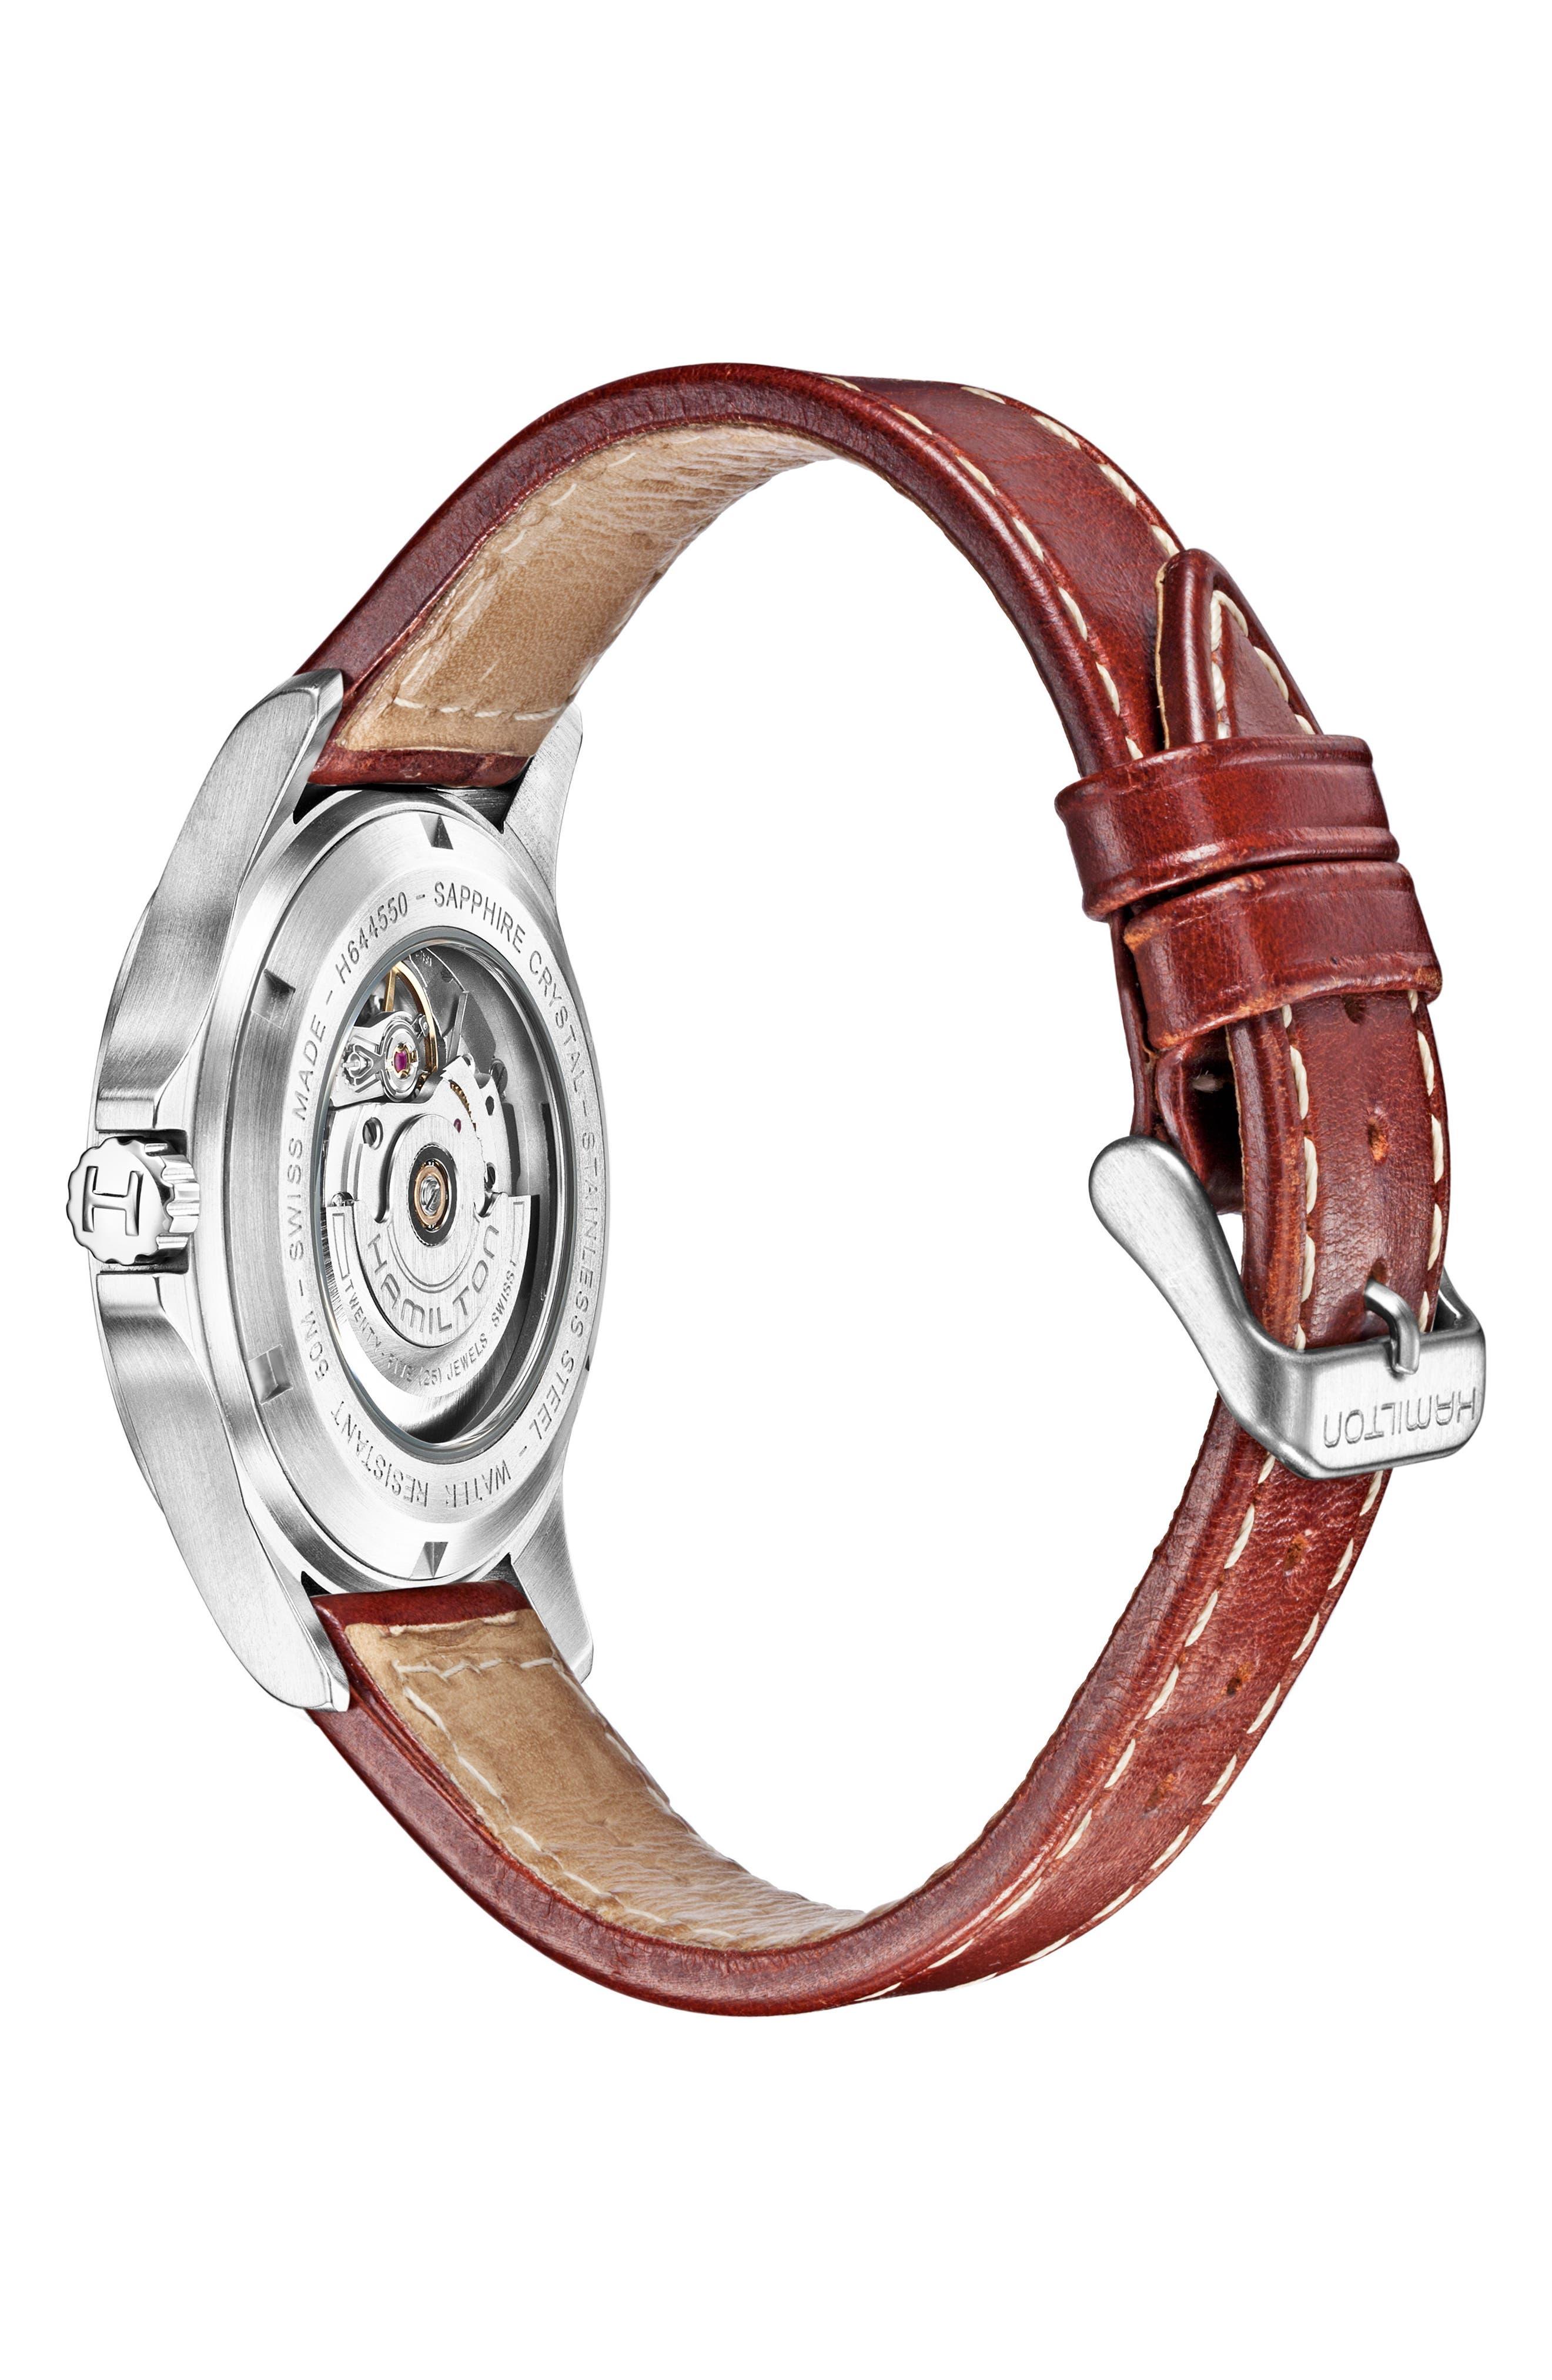 HAMILTON, Khaki King Automatic Leather Strap Watch, 40mm, Alternate thumbnail 2, color, BROWN/ BLACK/ SILVER